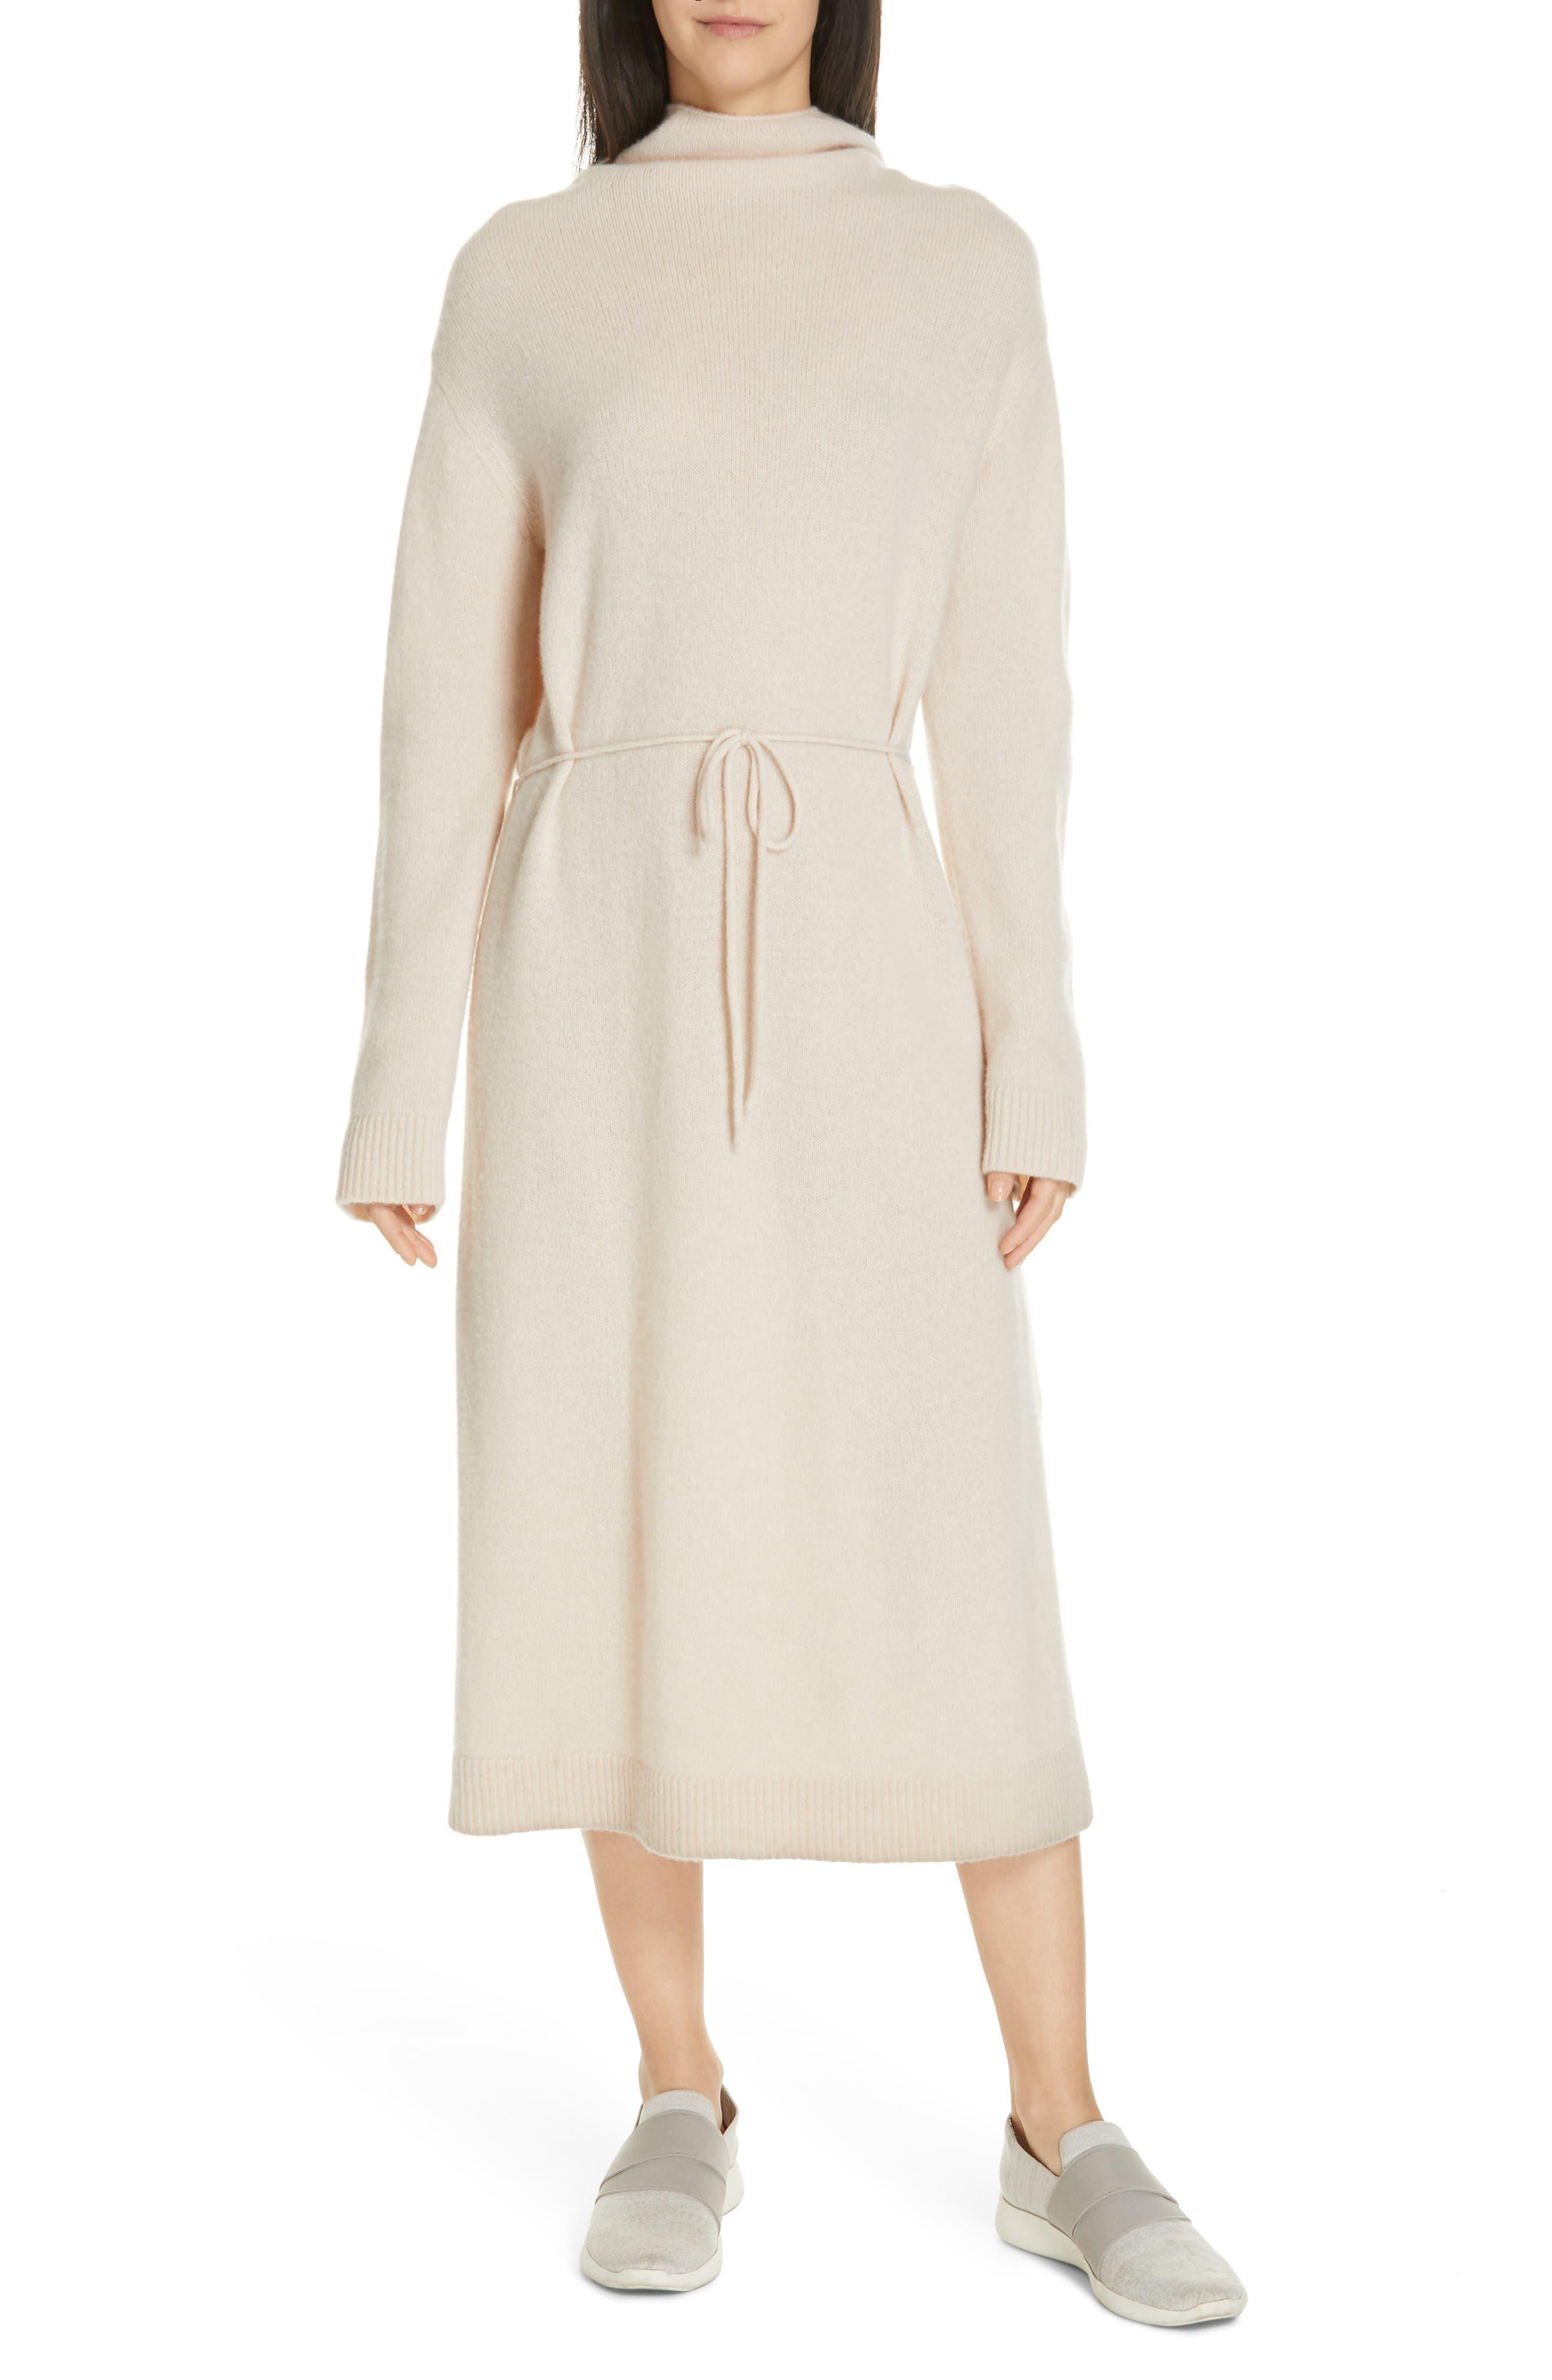 VINCE,                             Funnel Neck Wool & Cashmere Sweater Dress,                             Main thumbnail 1, color,                             BLUSH